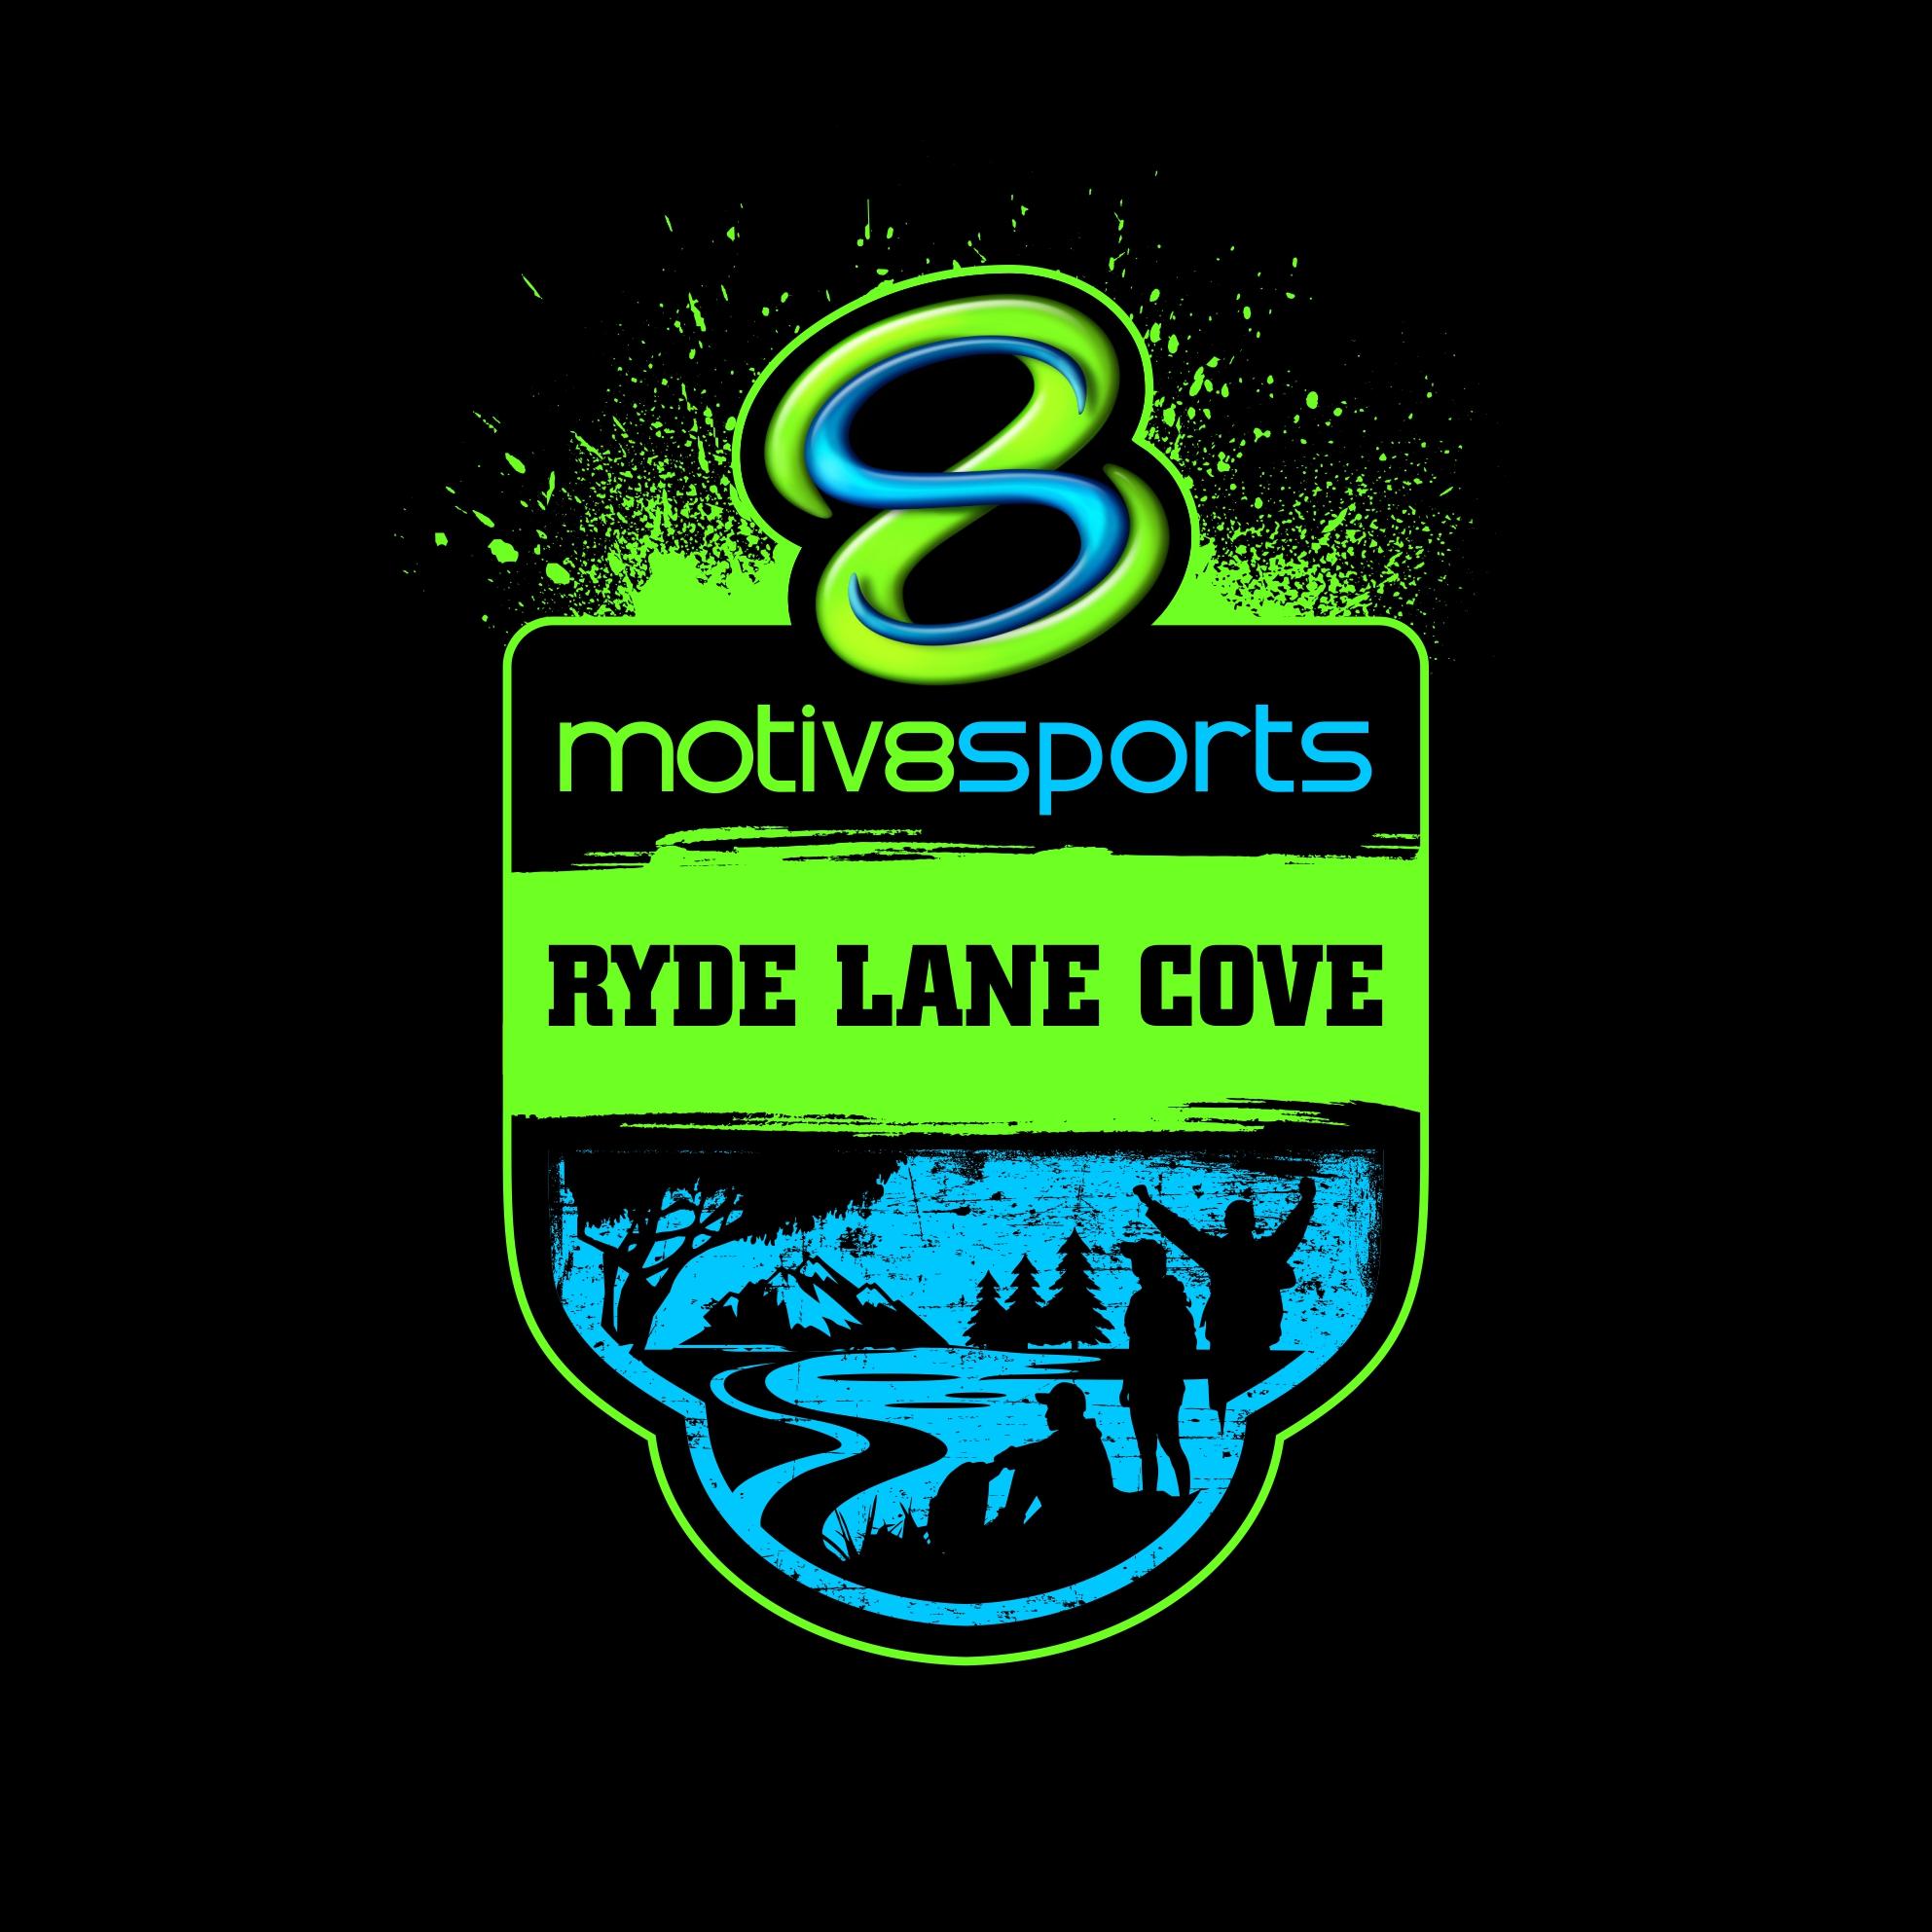 Motiv8sports Ryde Lane Cove